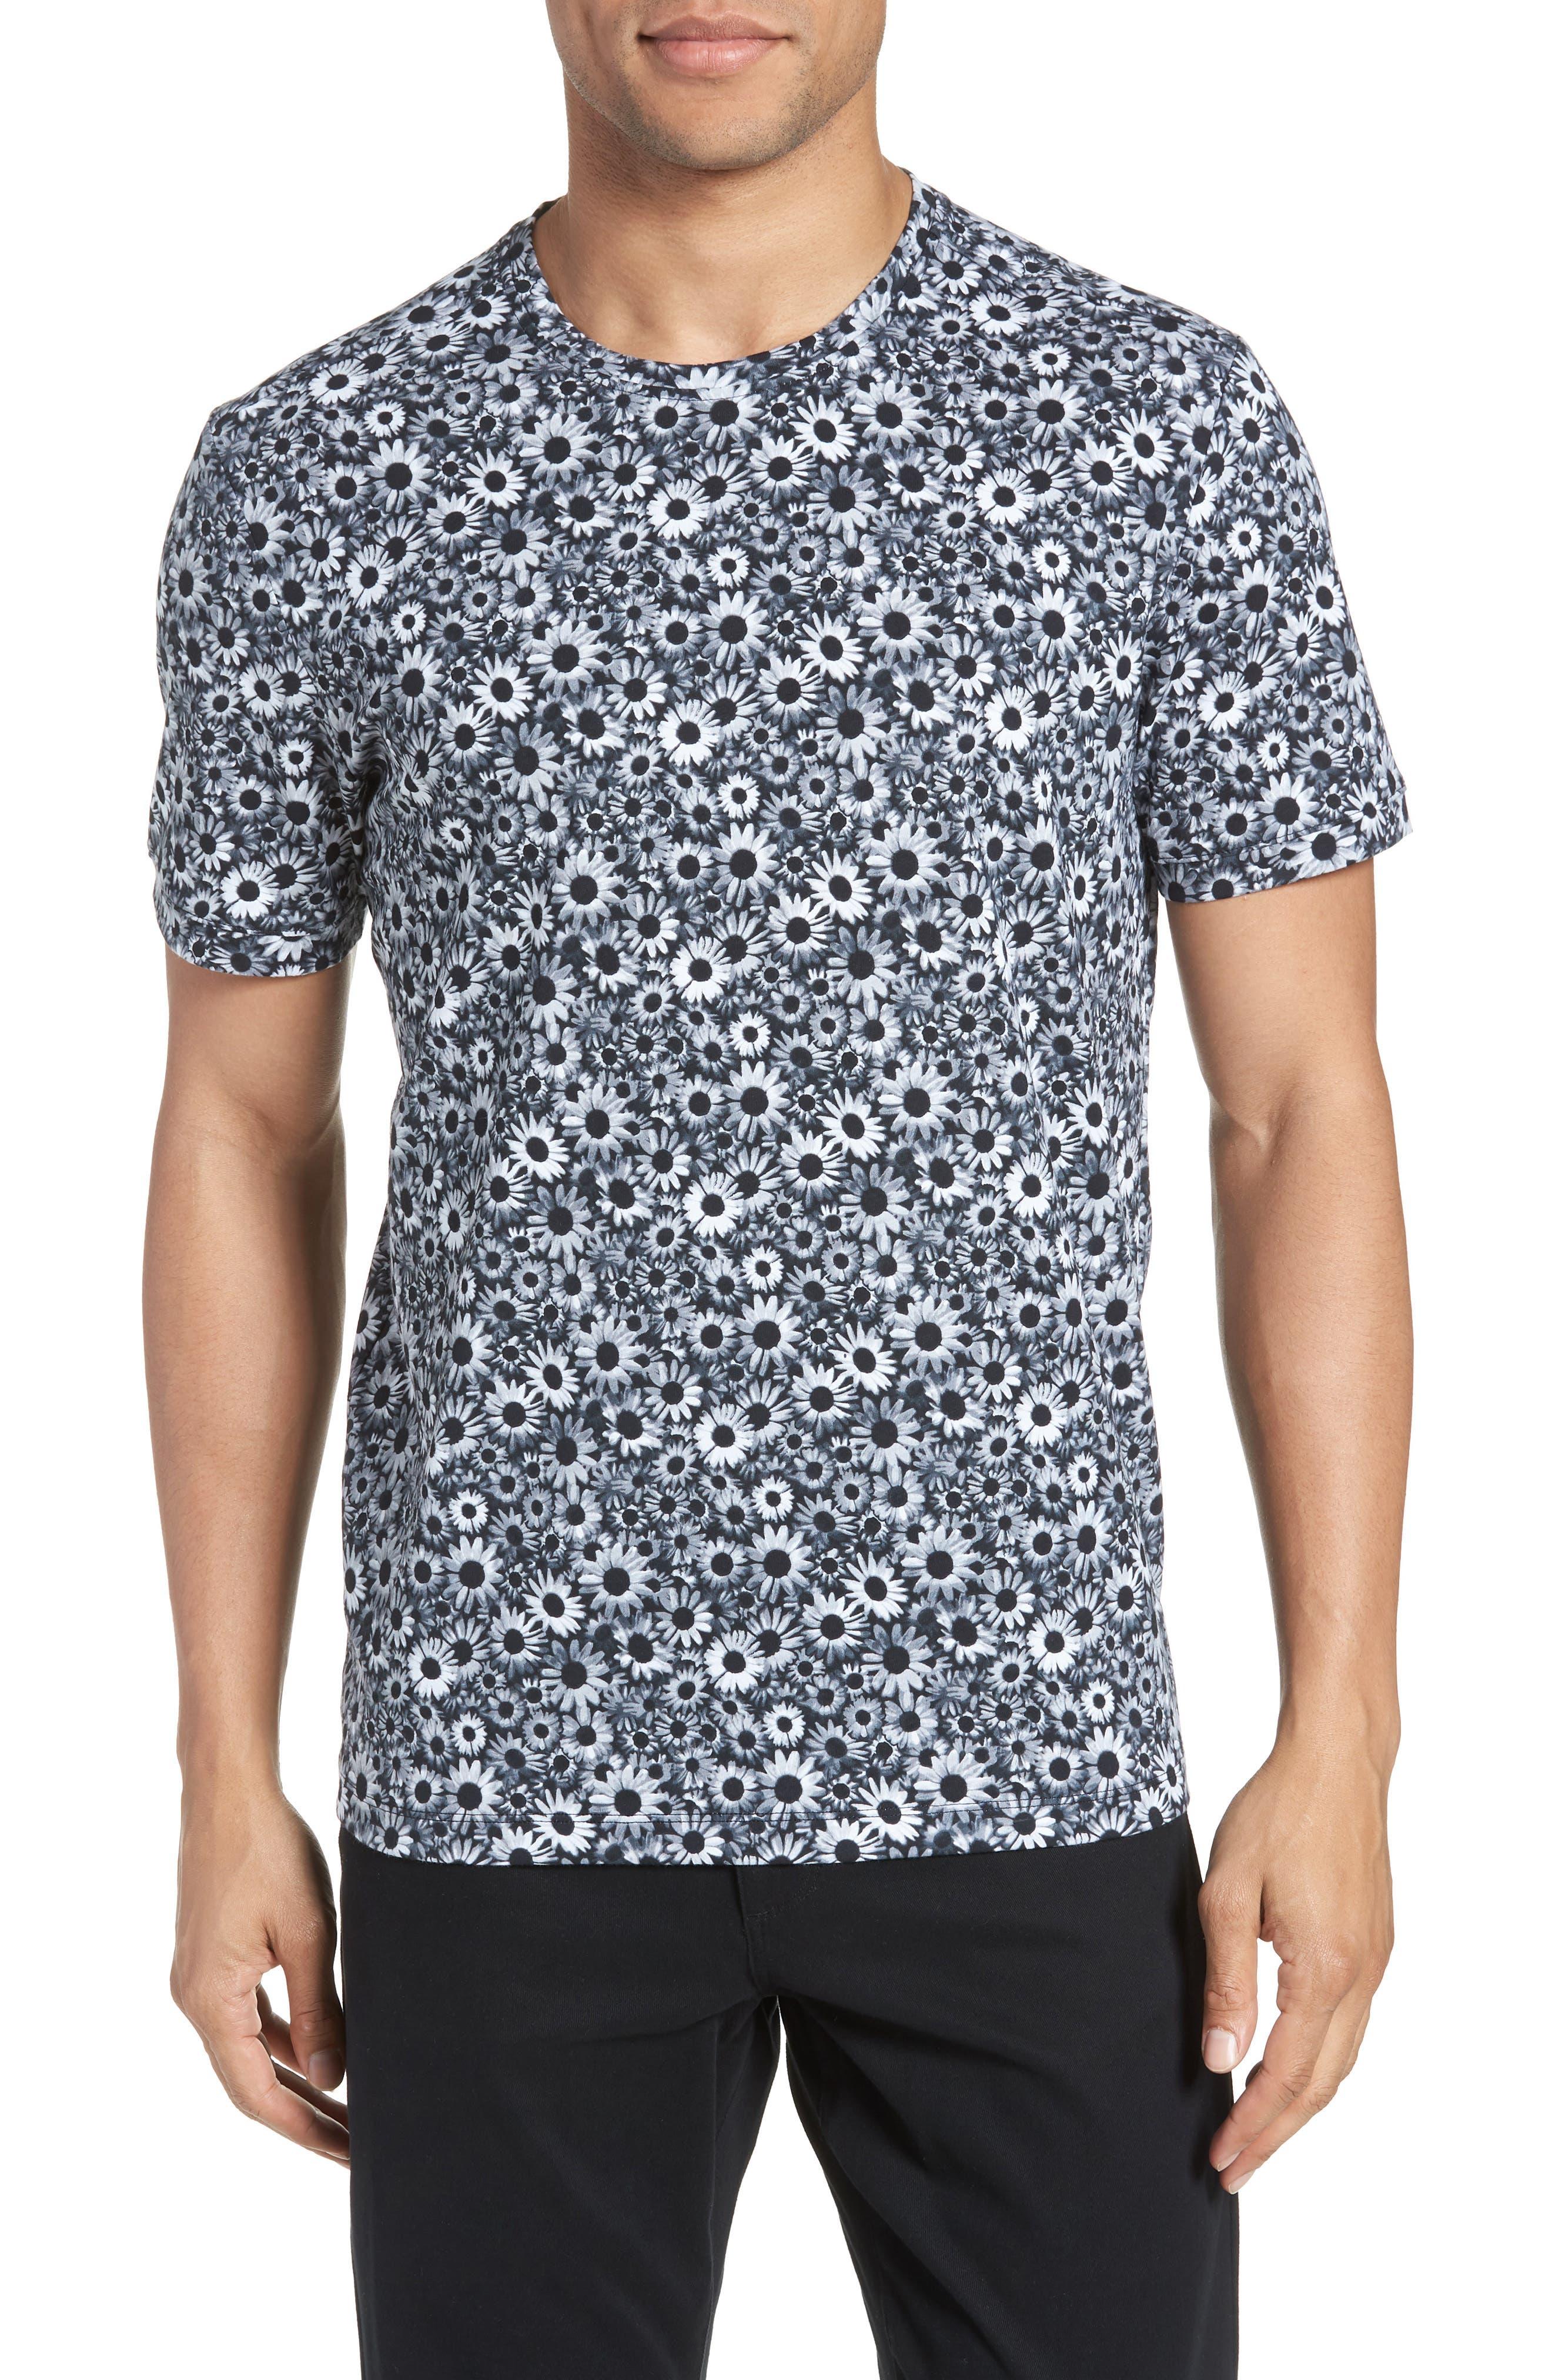 Print T-Shirt,                             Main thumbnail 1, color,                             BLACK WHITE DAISY FLORAL